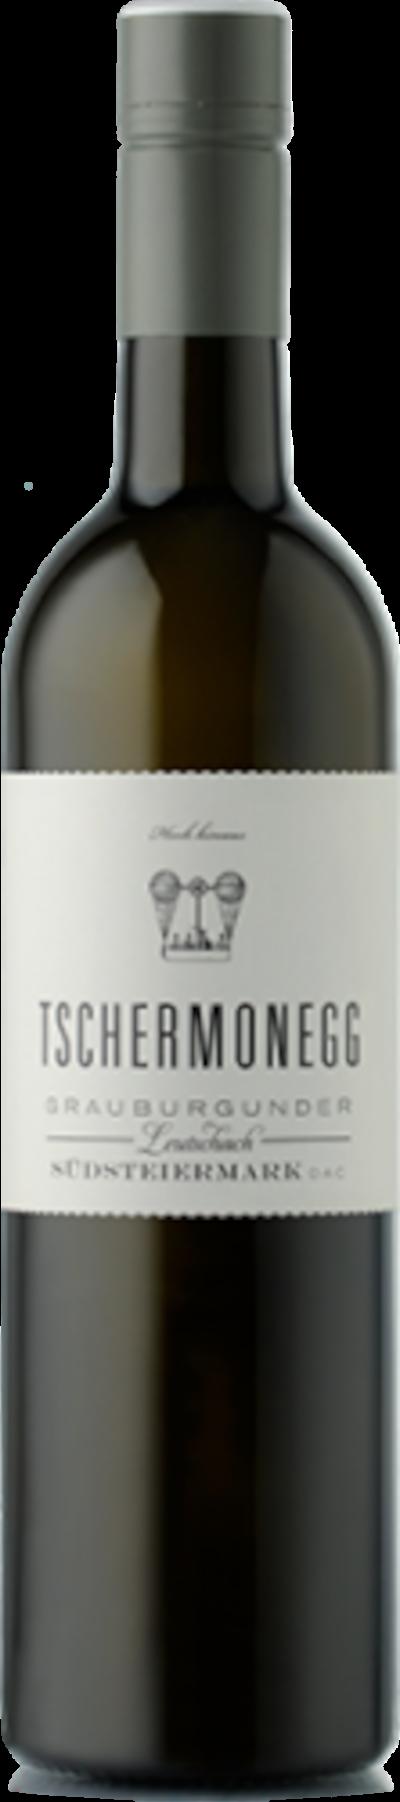 Tschermonegg - Grauburgunder Leutschach Südsteiermark DAC